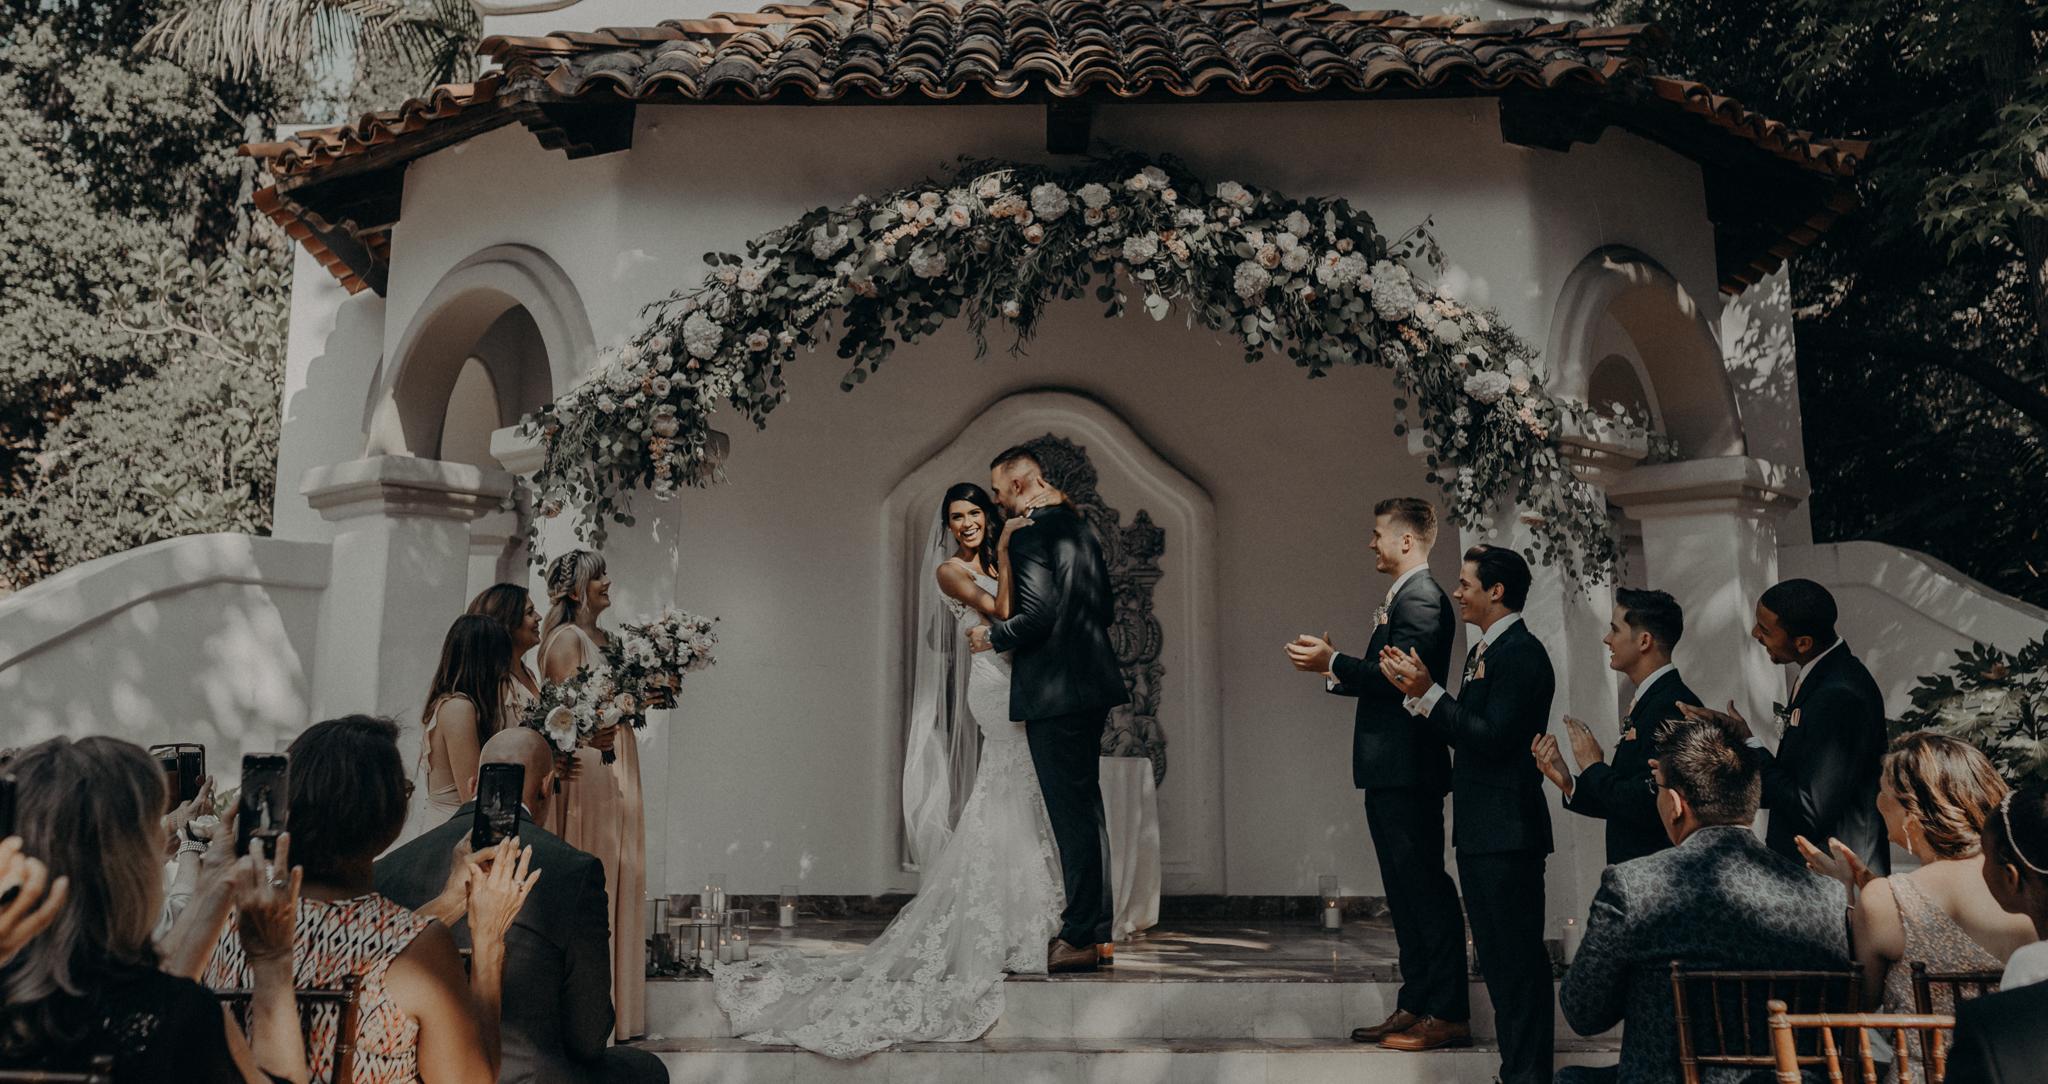 Isaiah + Taylor Photography - Rancho Las Lomas Wedding, Los Angeles Wedding Photographer-064.jpg